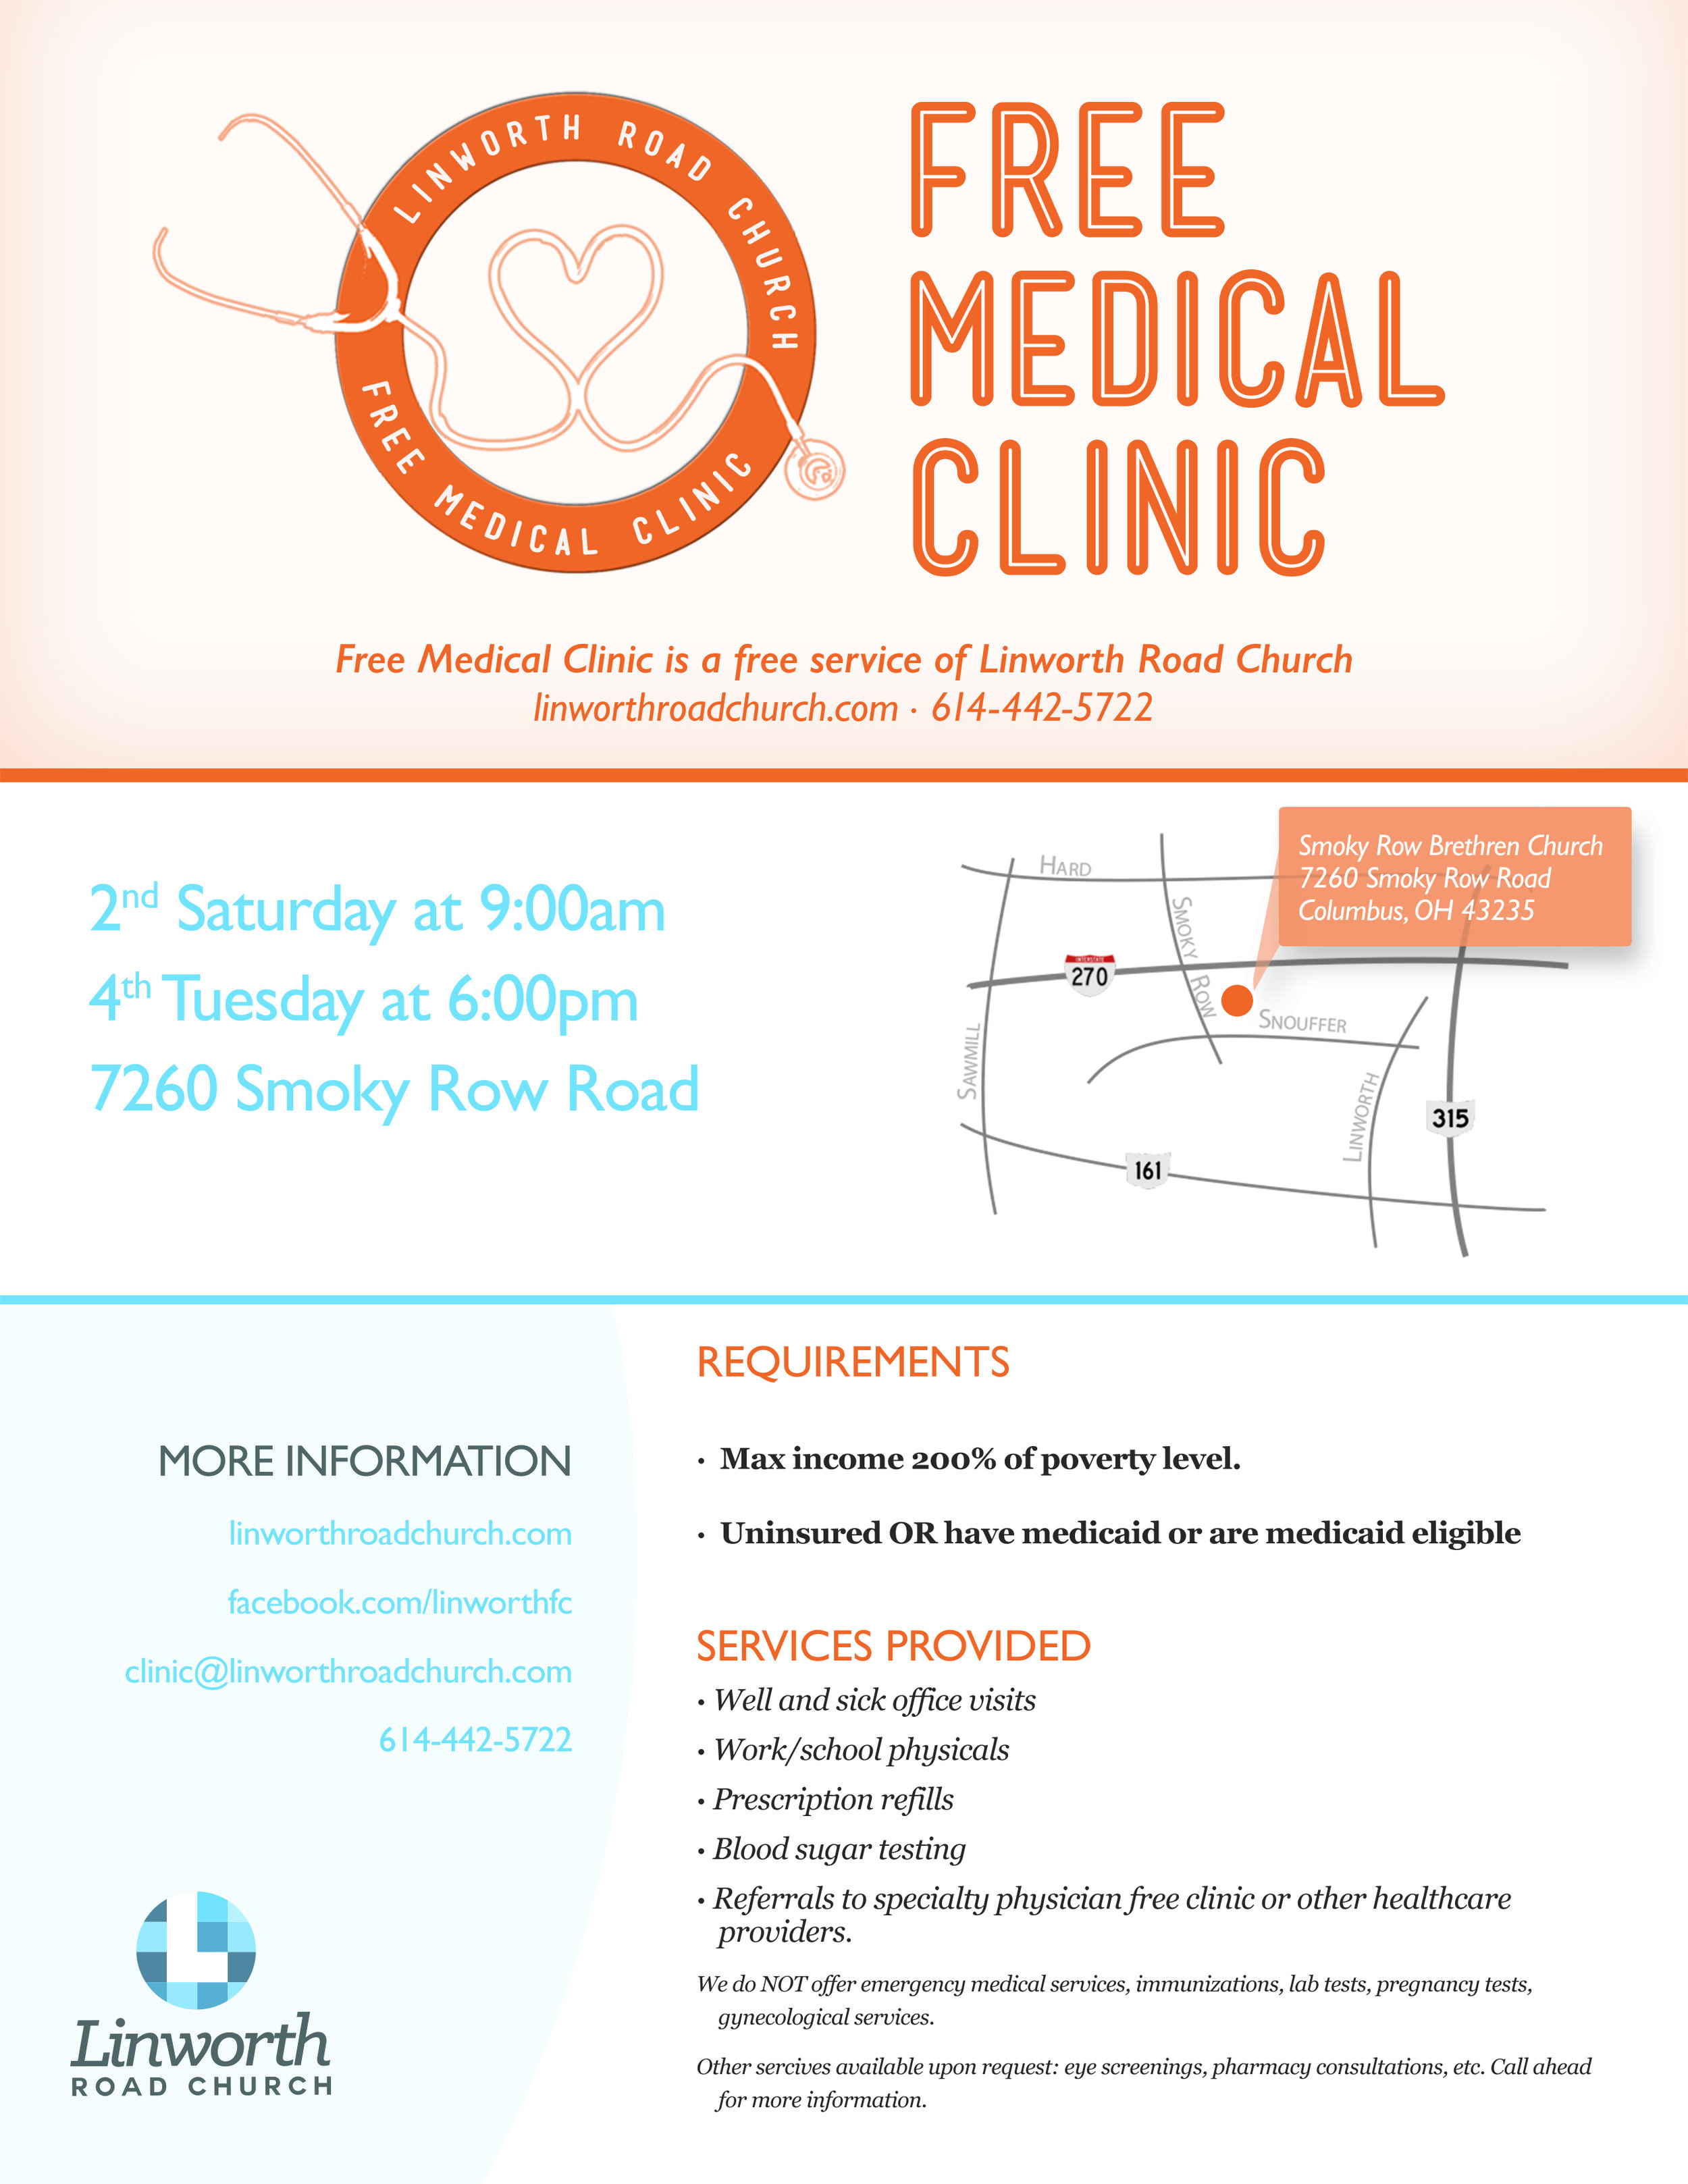 Linworth Road Church | Free Medical Clinic